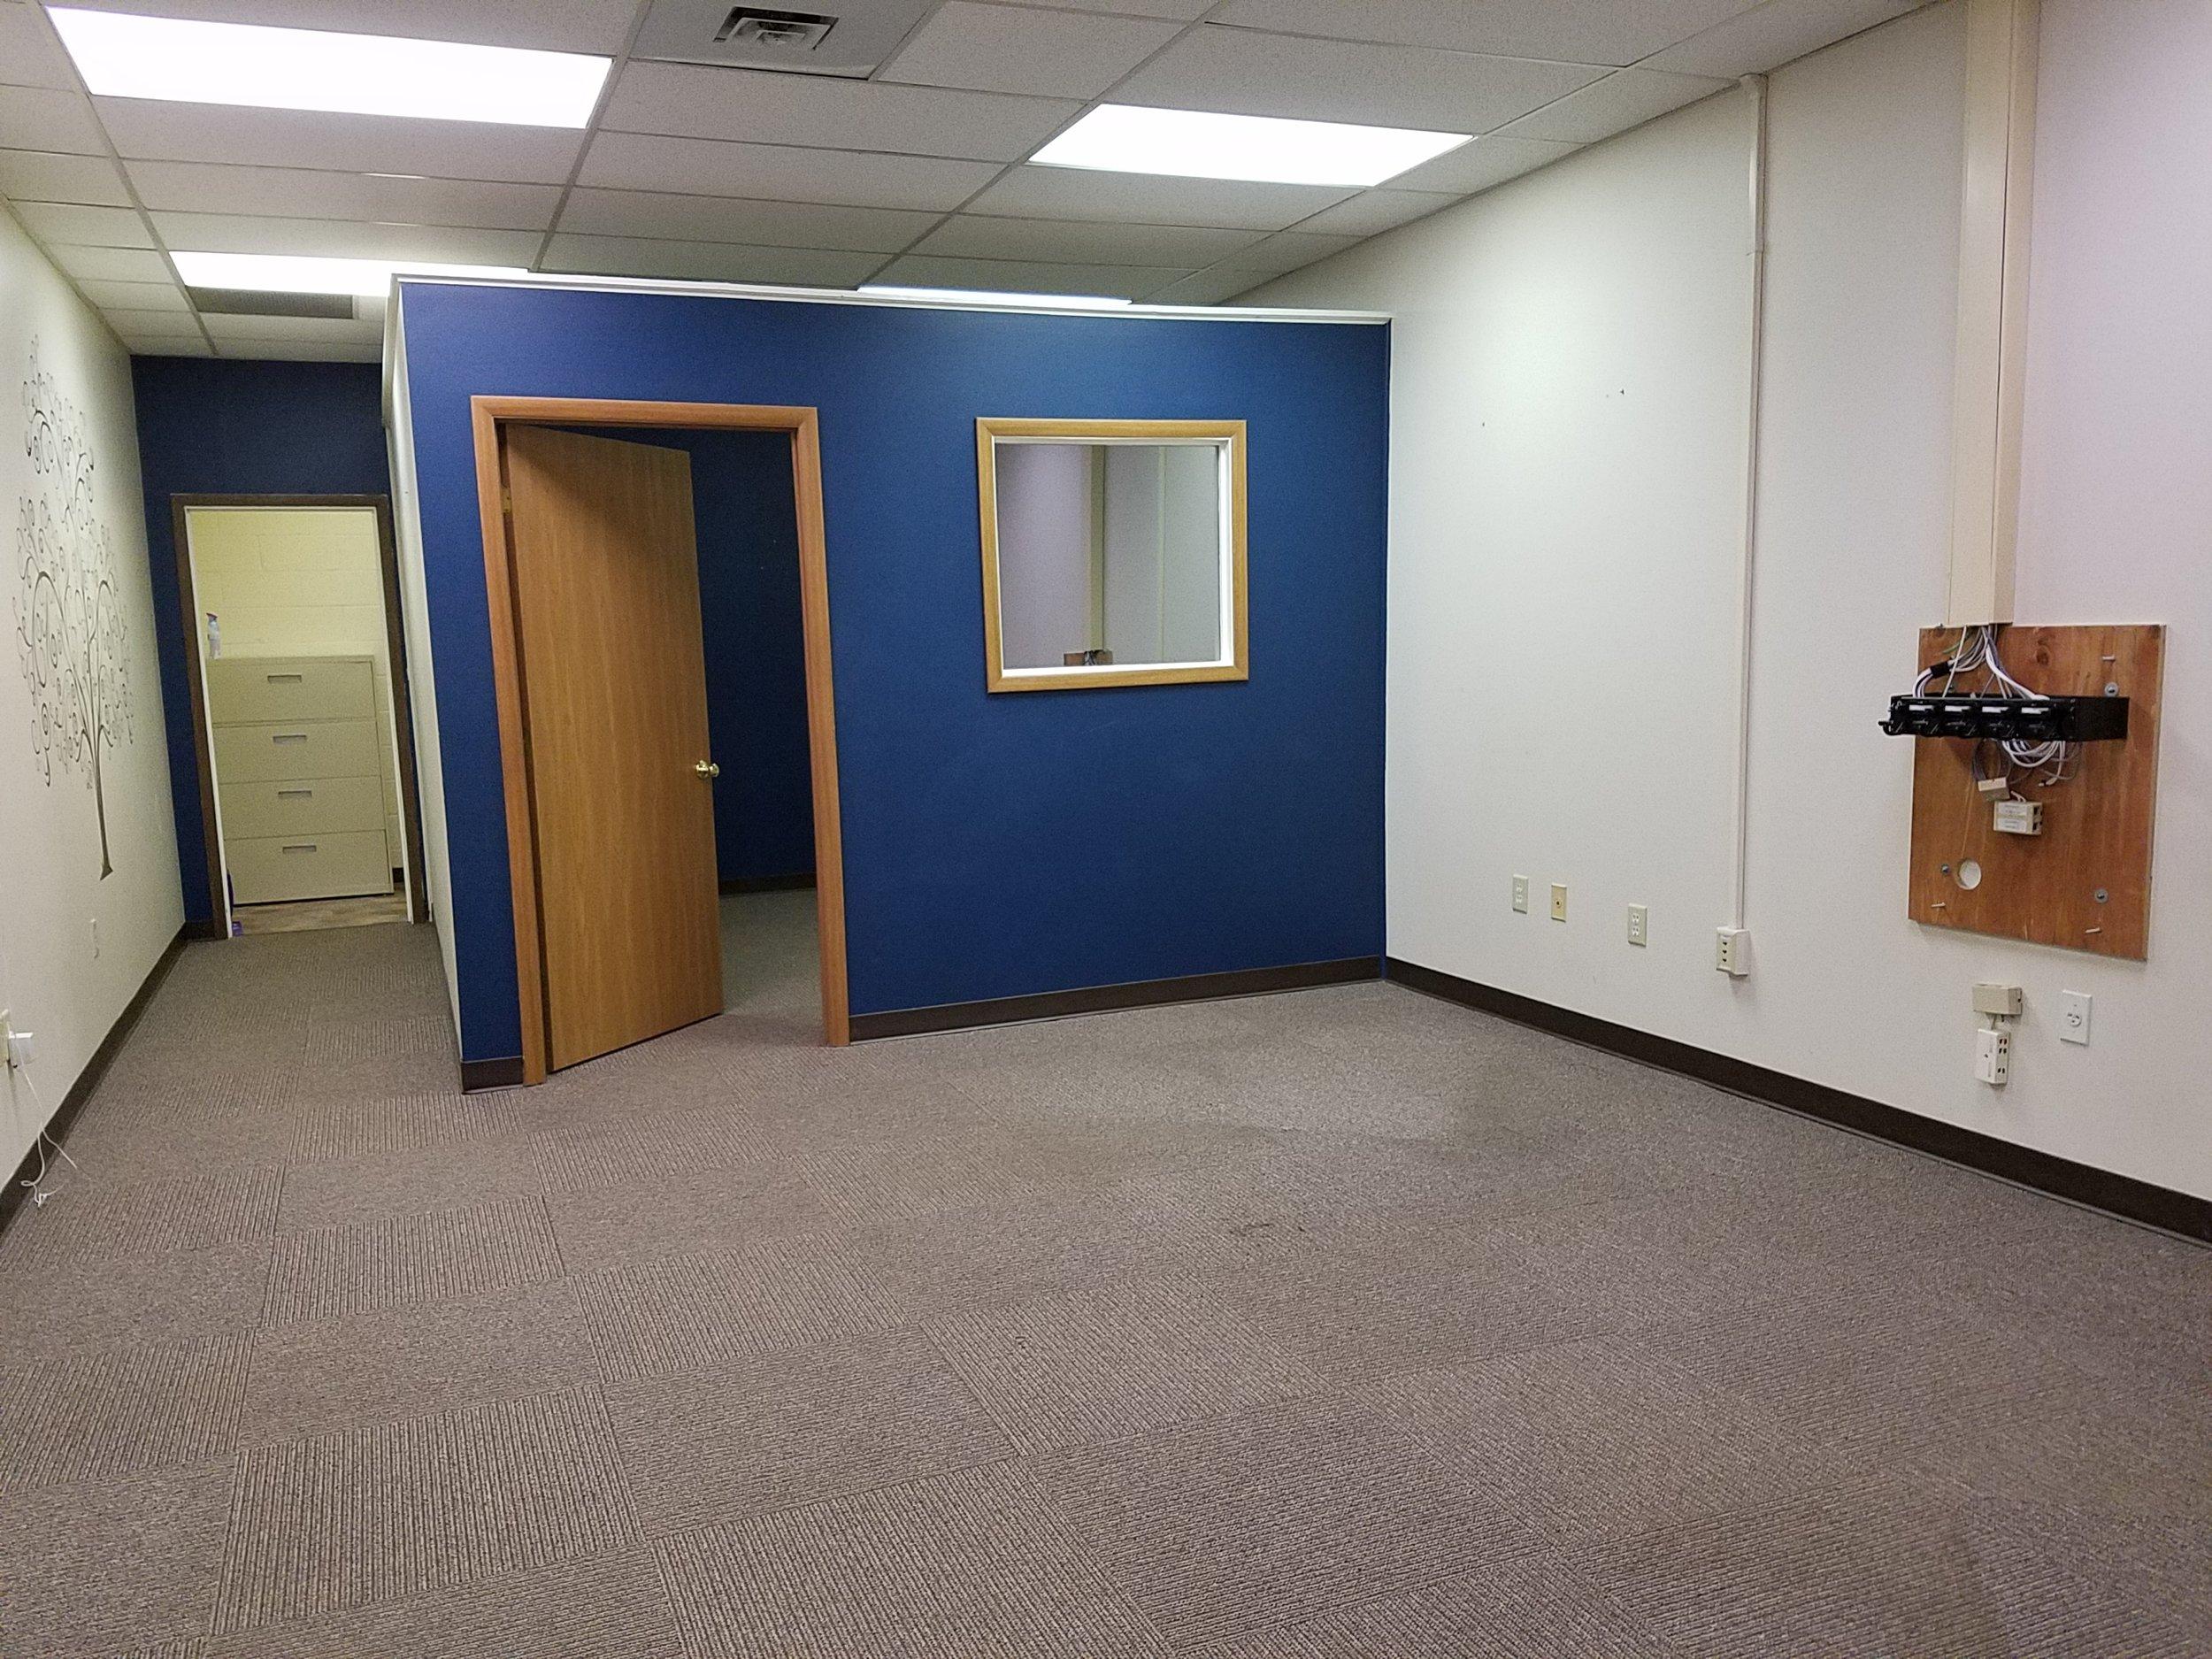 214 College Park Plaza, Richland Township - Suite 105 - $1000 per month